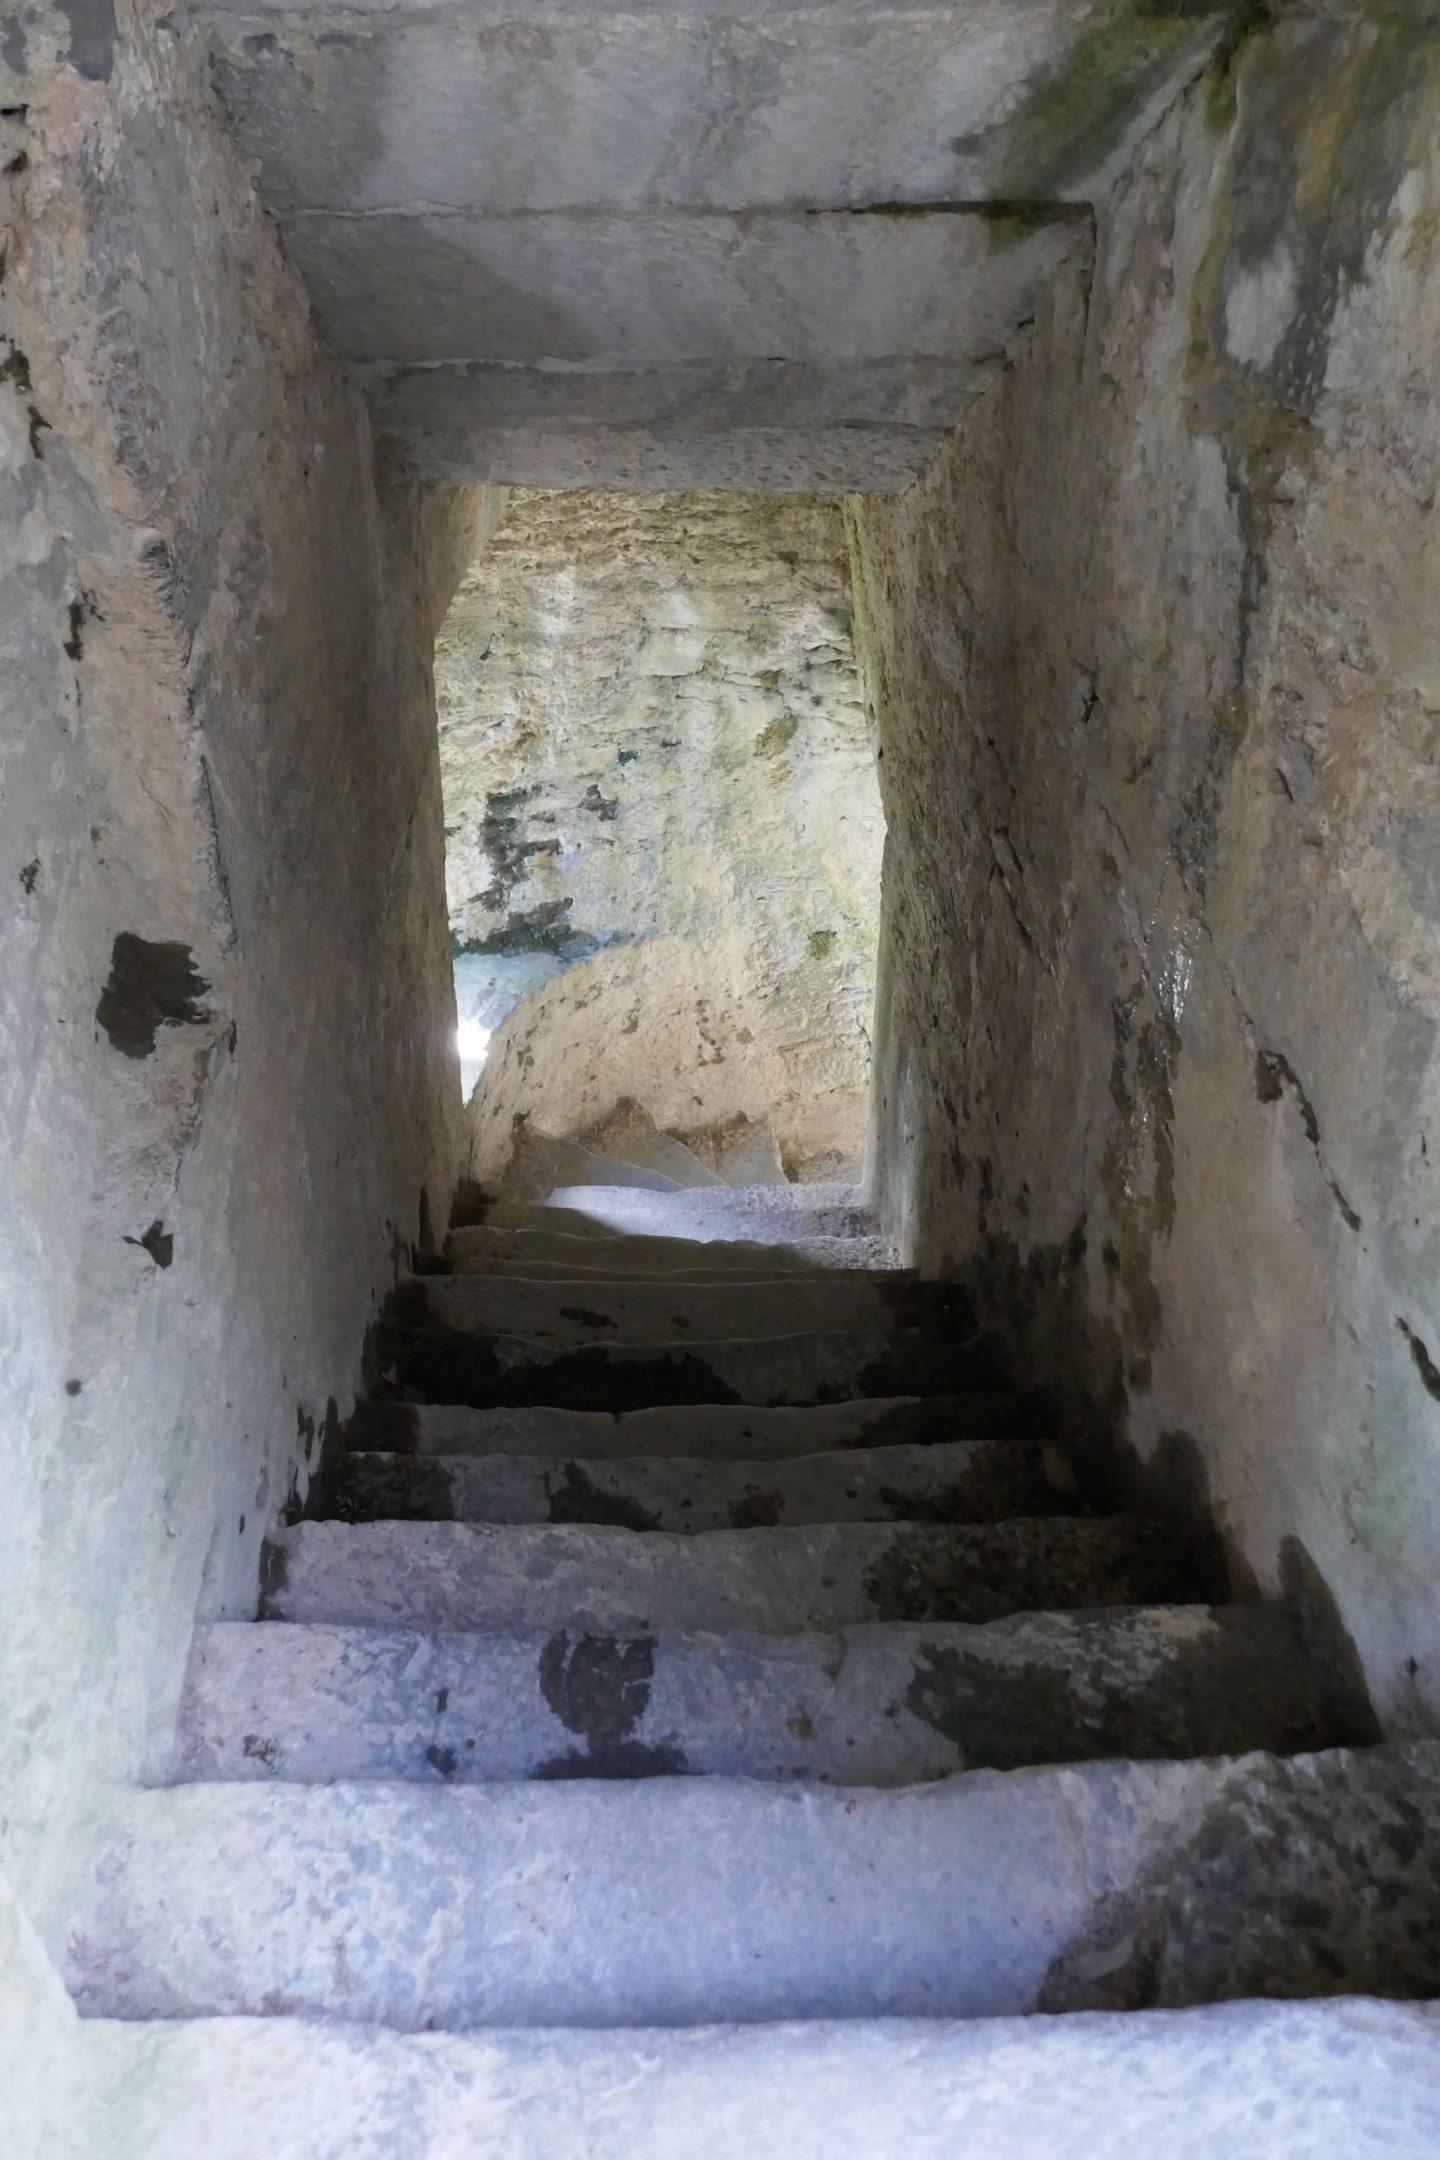 Stairs inside Muckross Abbey